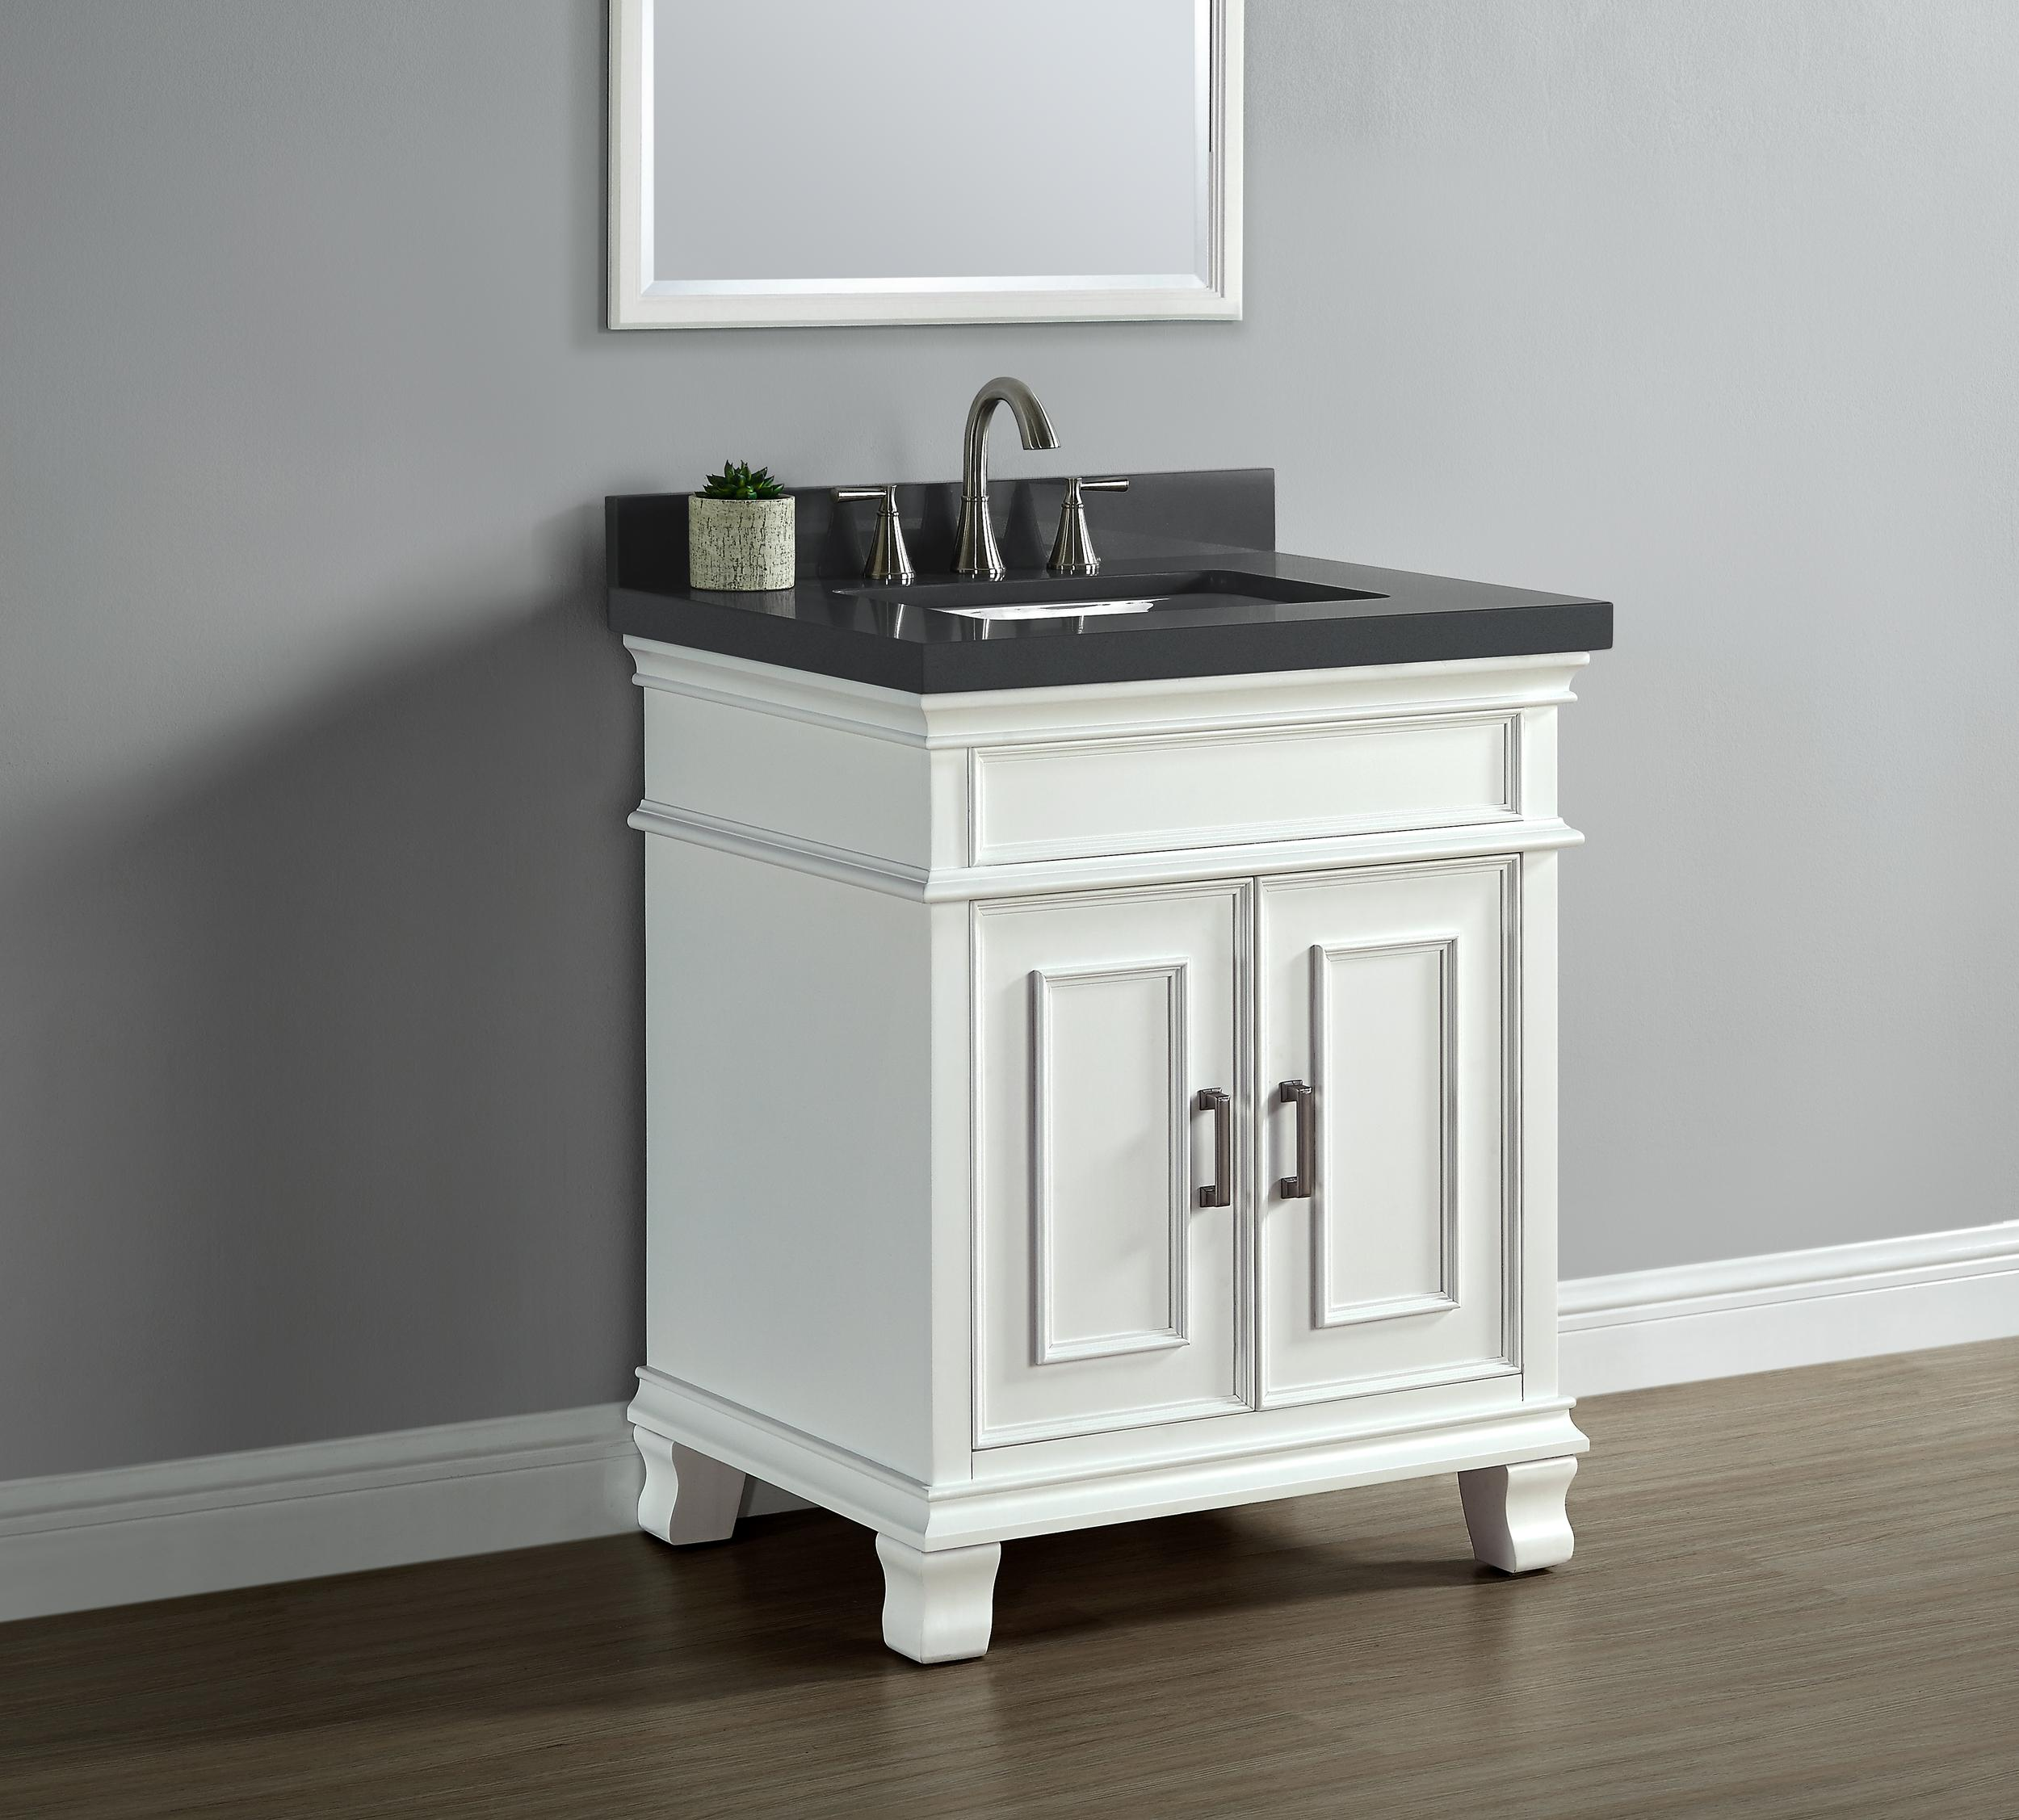 "28 Inch Bathroom Vanity With Sink: Amazon.com: Mission Hills 28"" Single Sink Middleton Vanity"